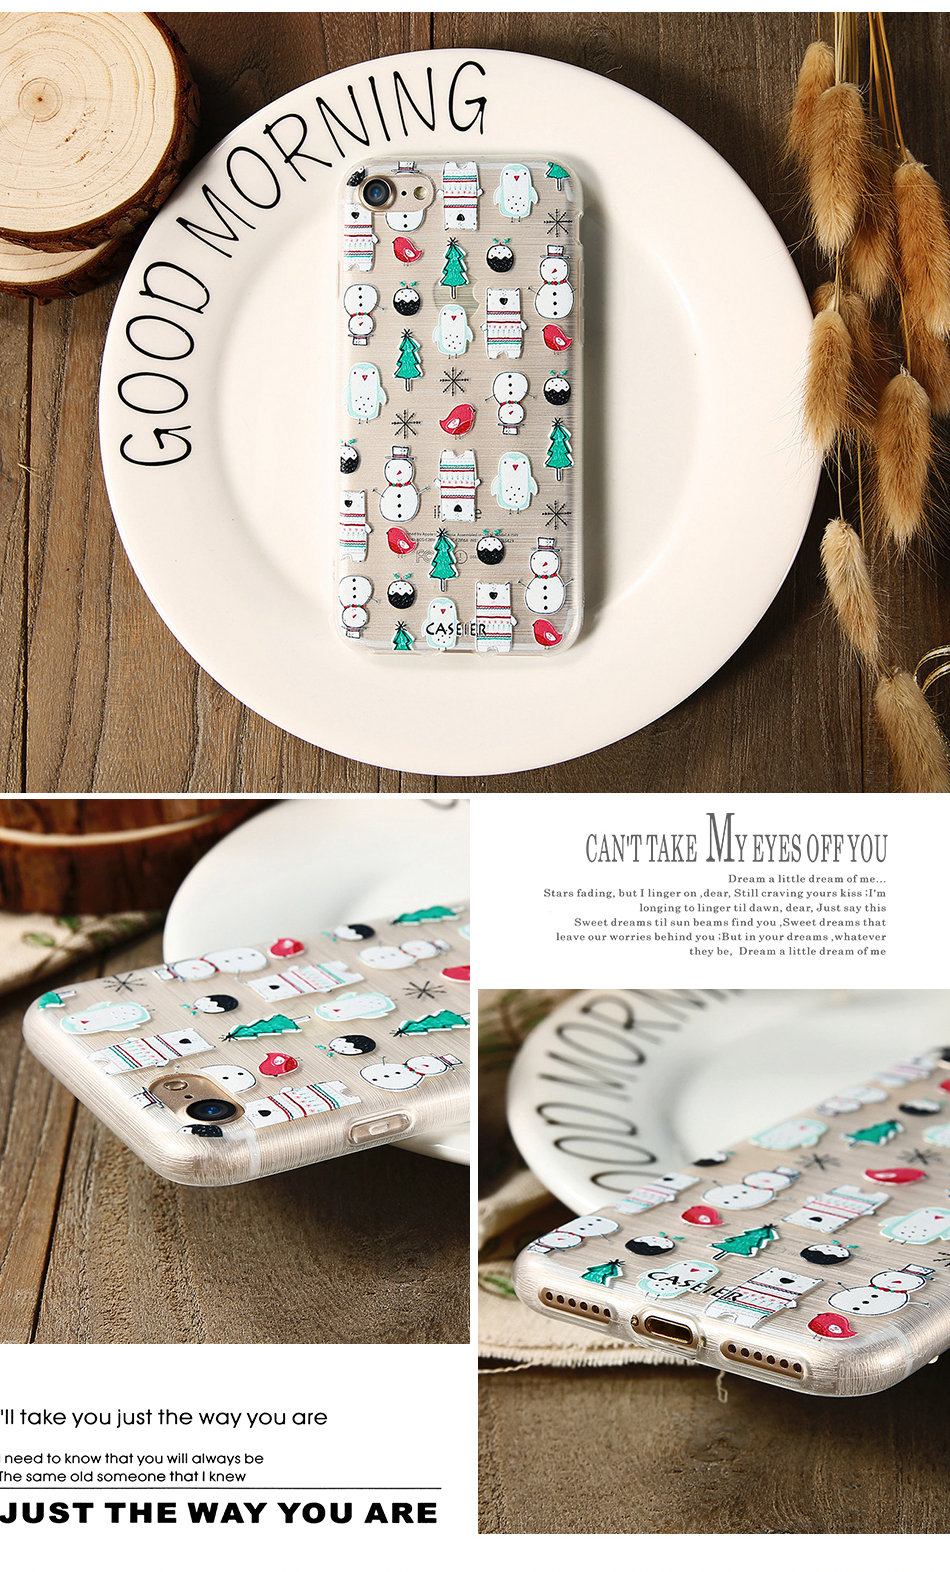 HTB1BiJFOpXXXXcwaFXXq6xXFXXXn - Christmas Phone Case For iPhone 7 6 6S Plus iPhone 5S SE 5 Cases For Samsung Galaxy S6 S7 Edge Cute Cover Accessories PTC 286